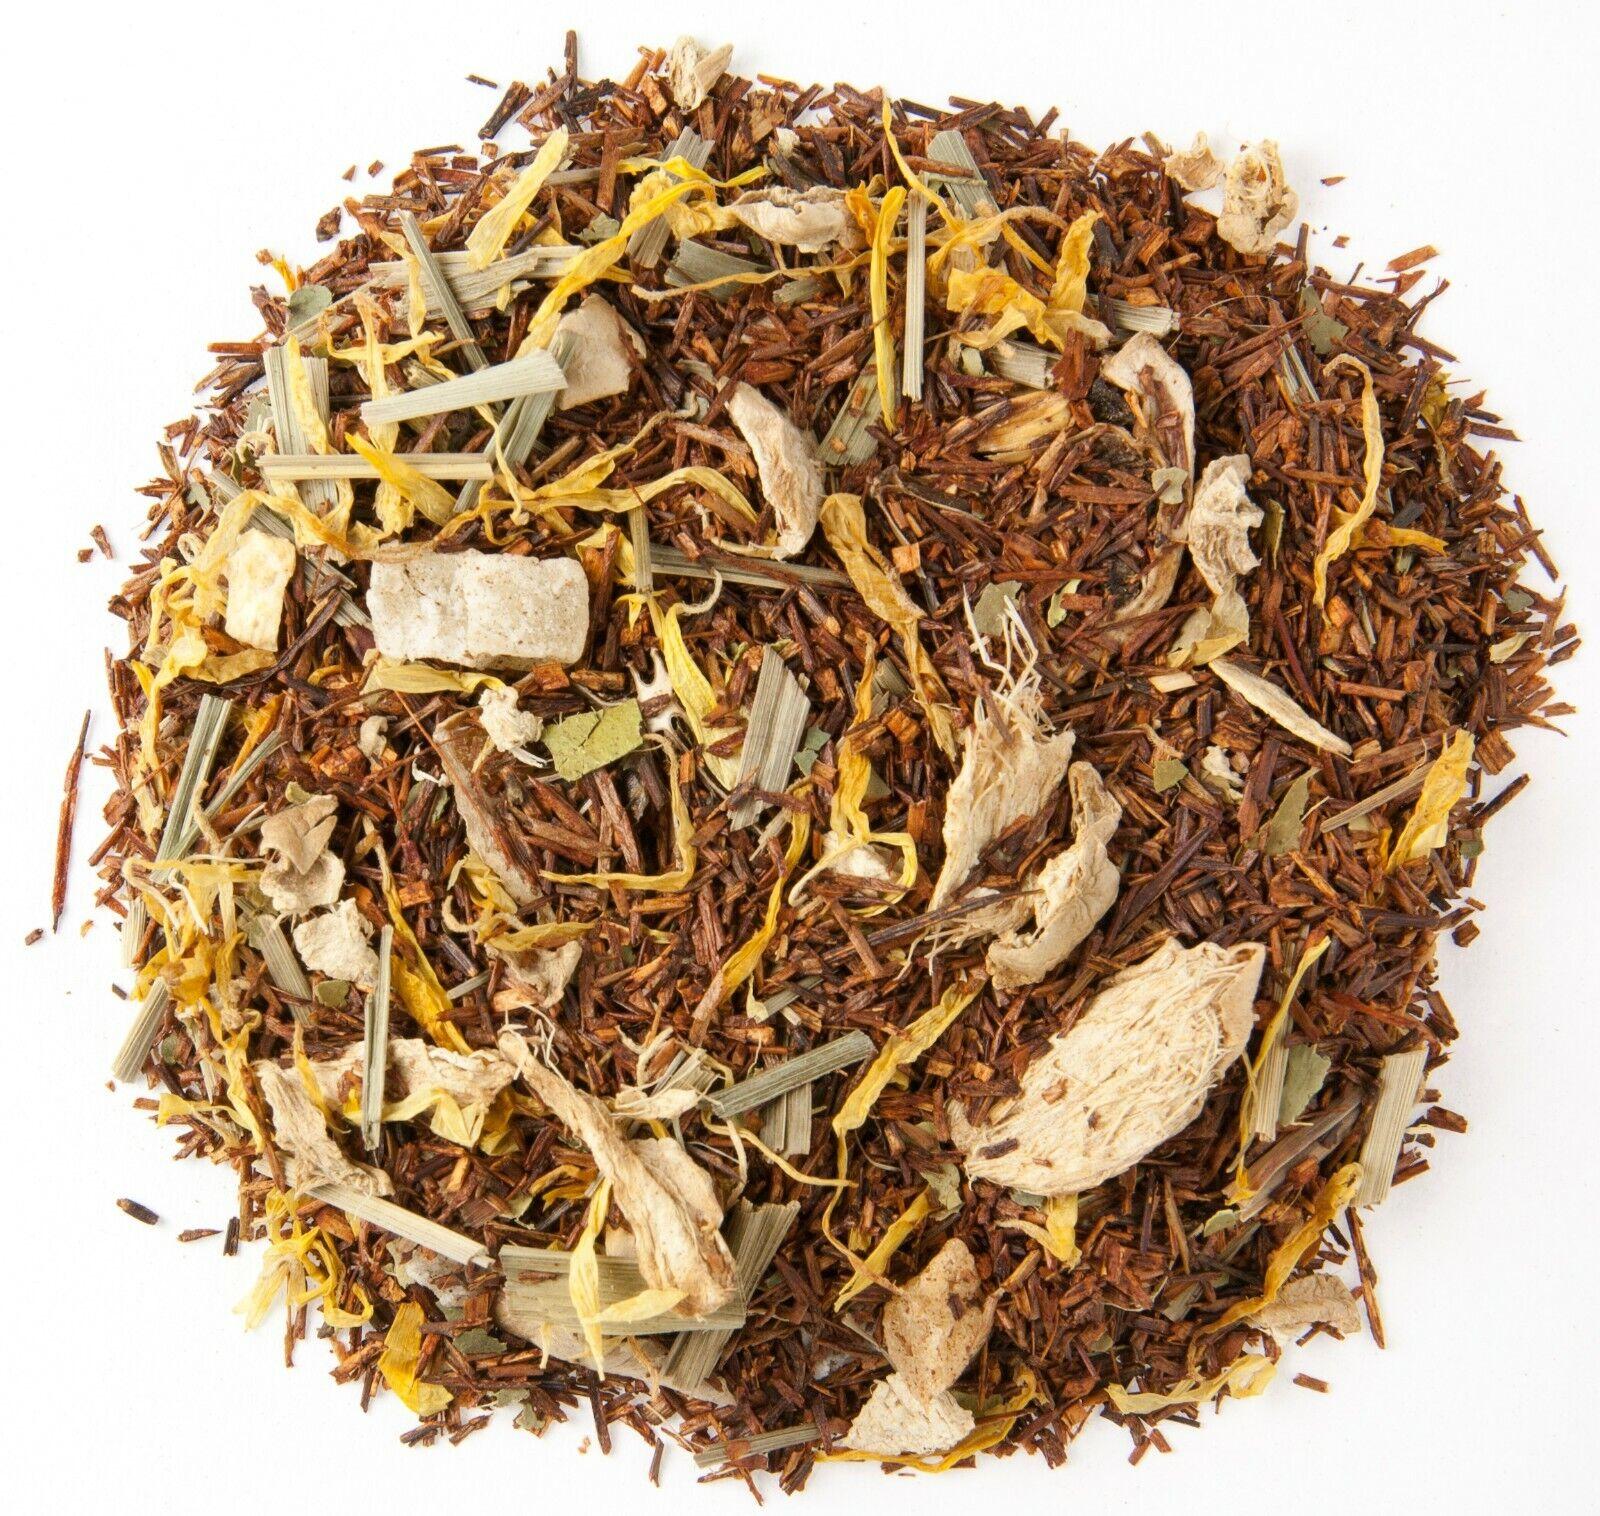 Thai Lemon Ginger Rooibos Loose Leaf Tea - 1/2 lb